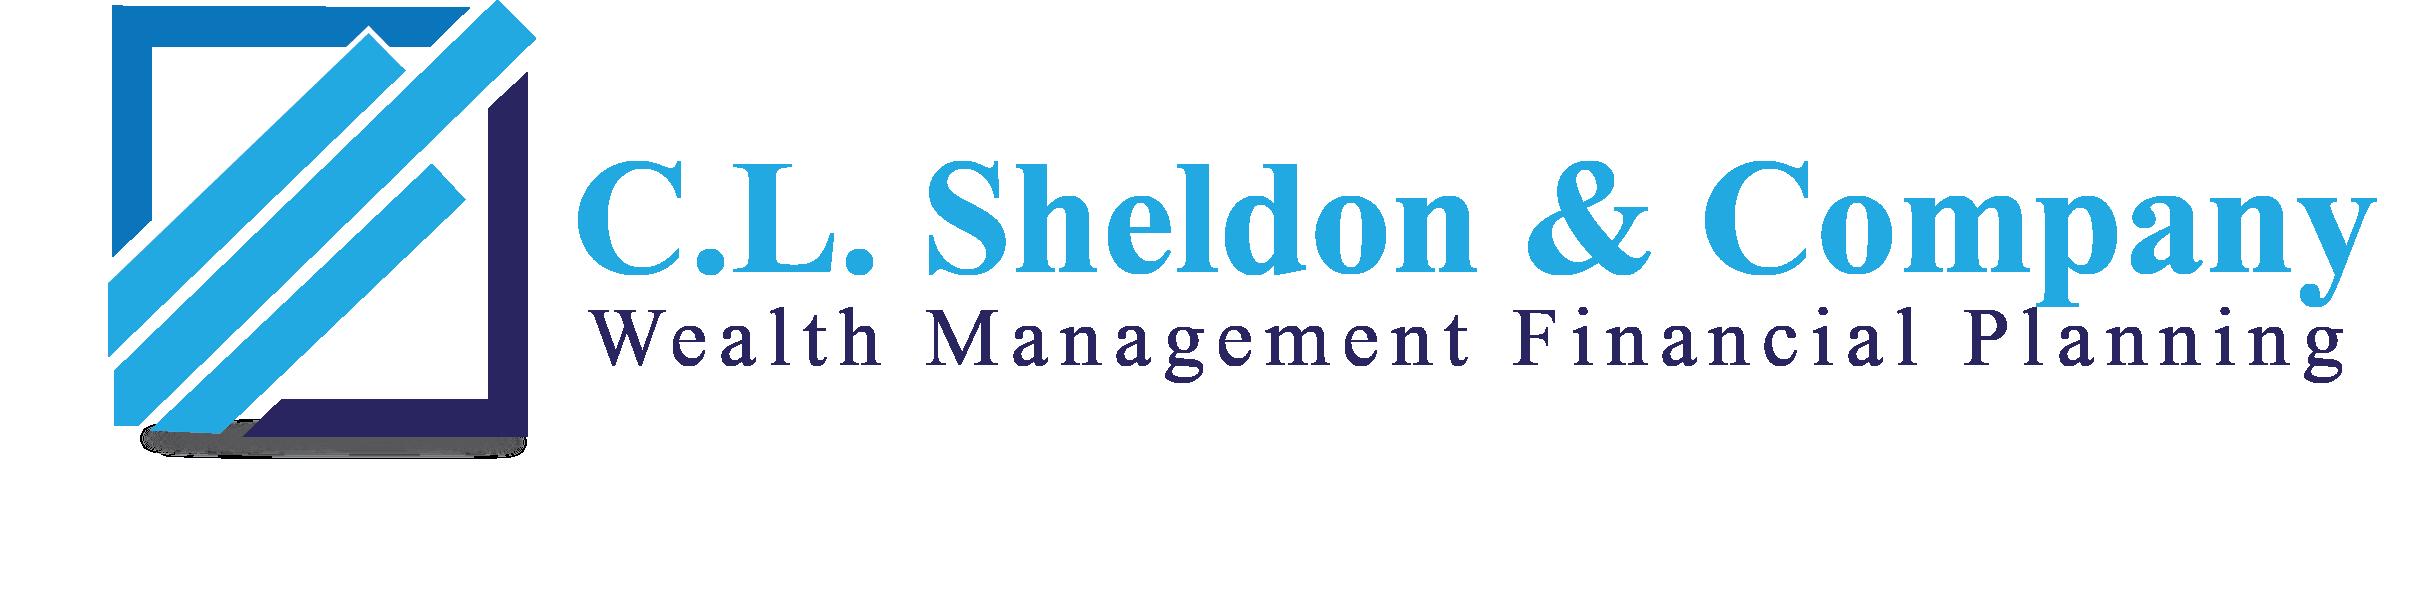 C.L. Sheldon & Company